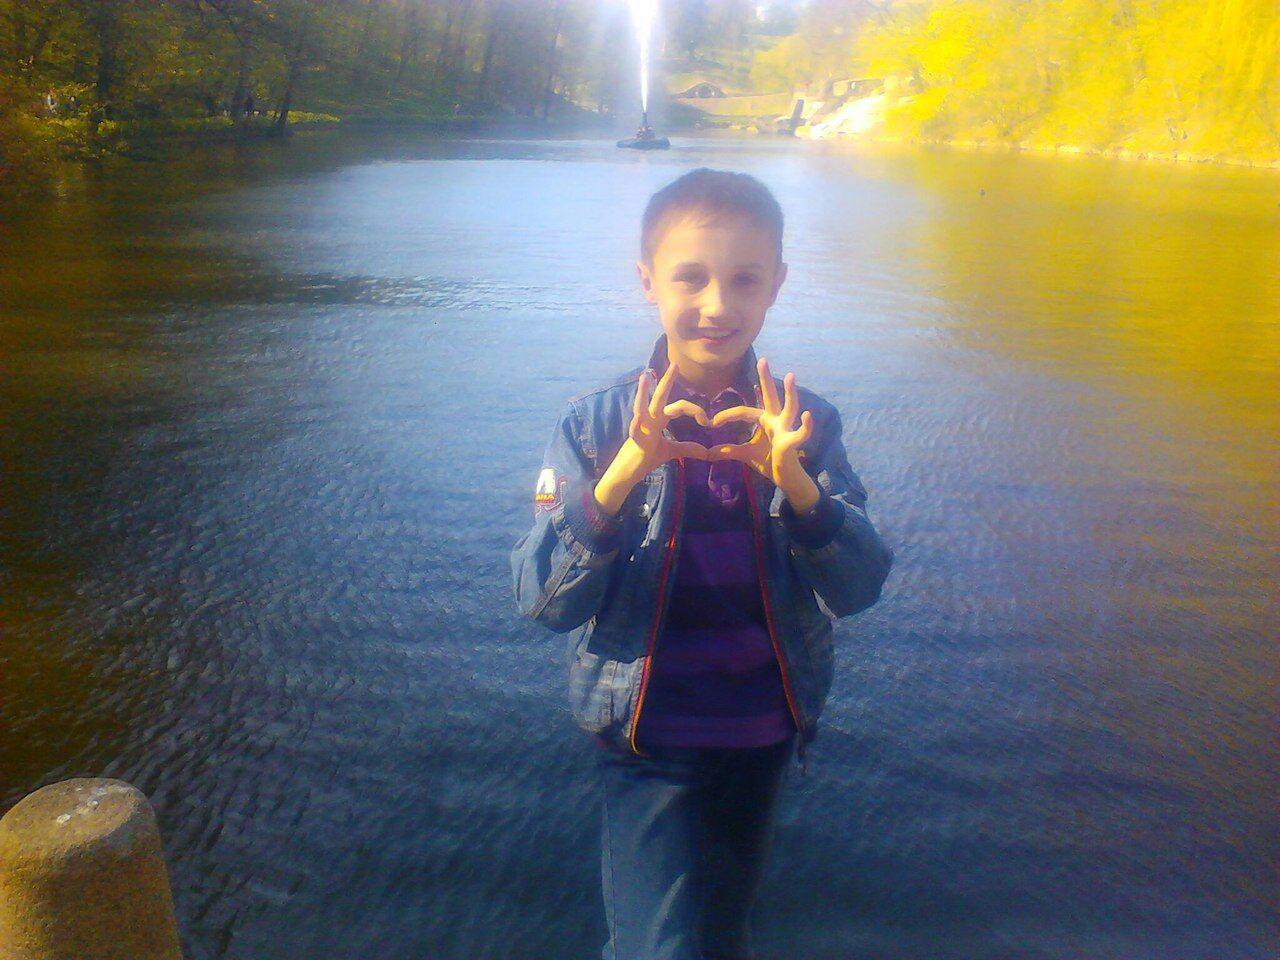 12-летний Руслан Непотенко